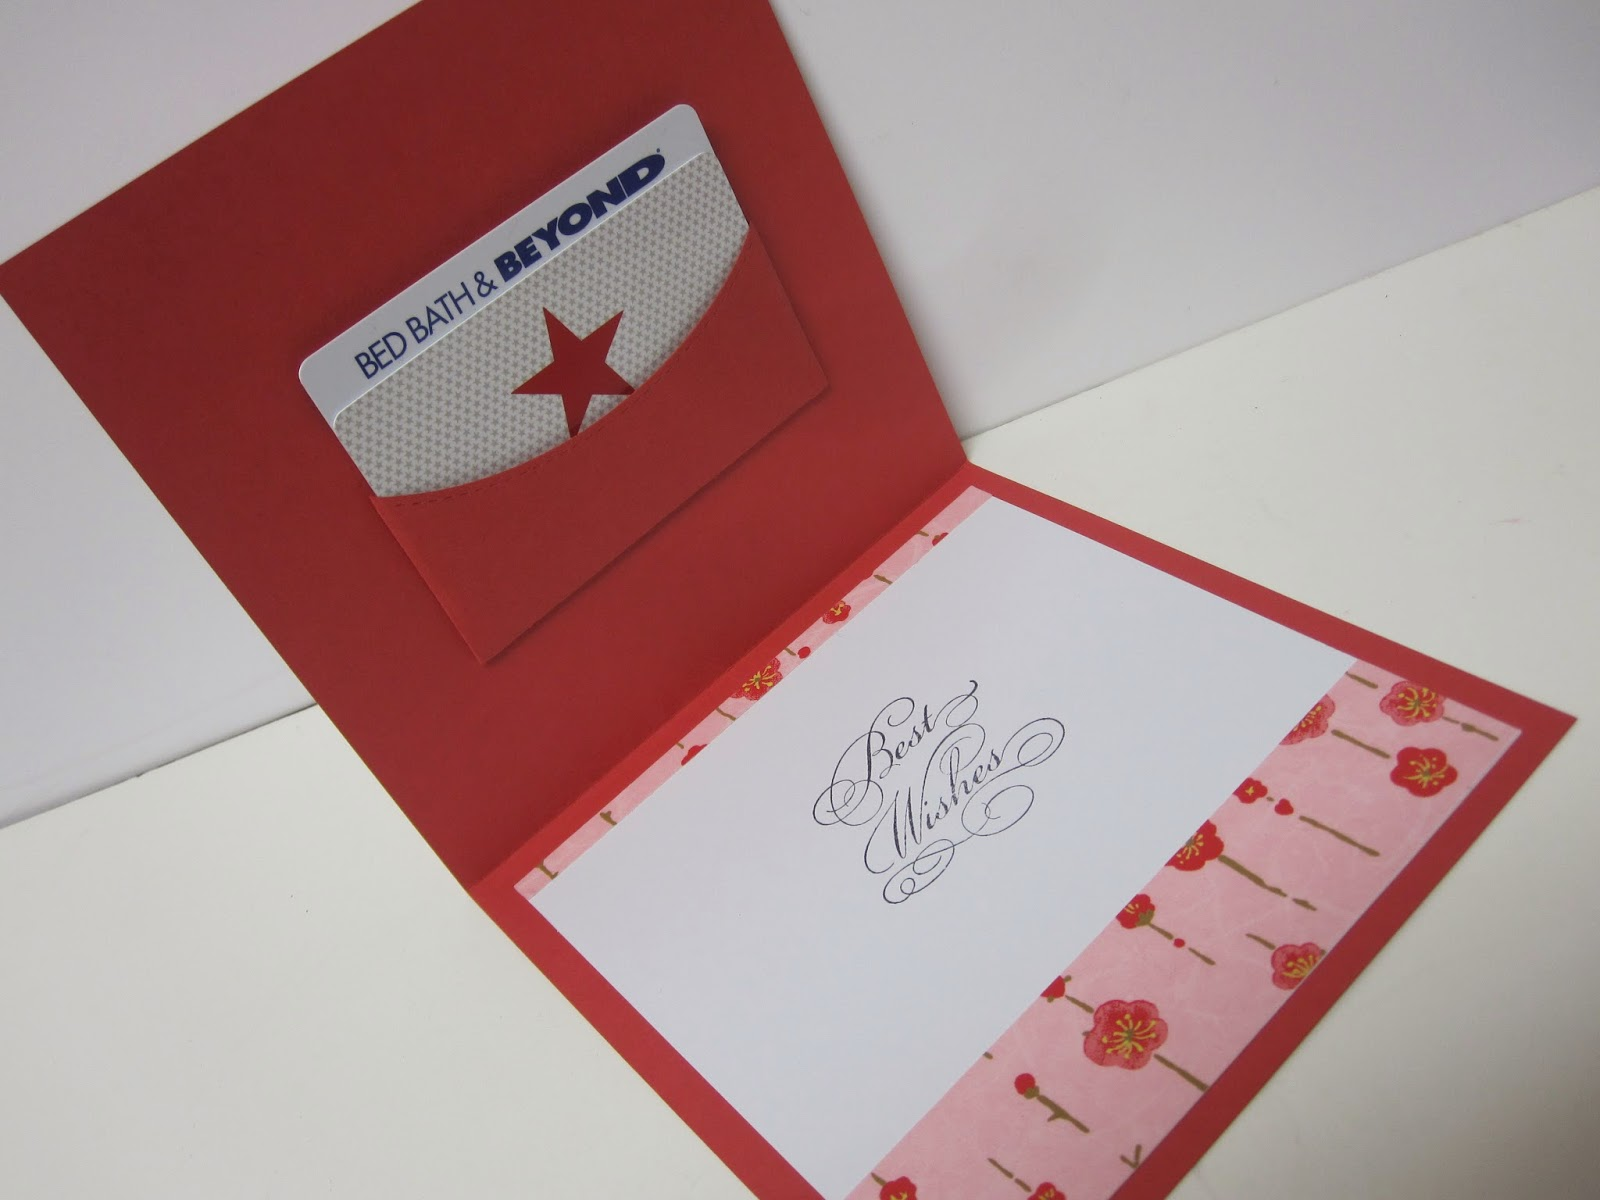 Creations by Patti: Stampingbella Brett and Brenda Wedding Card